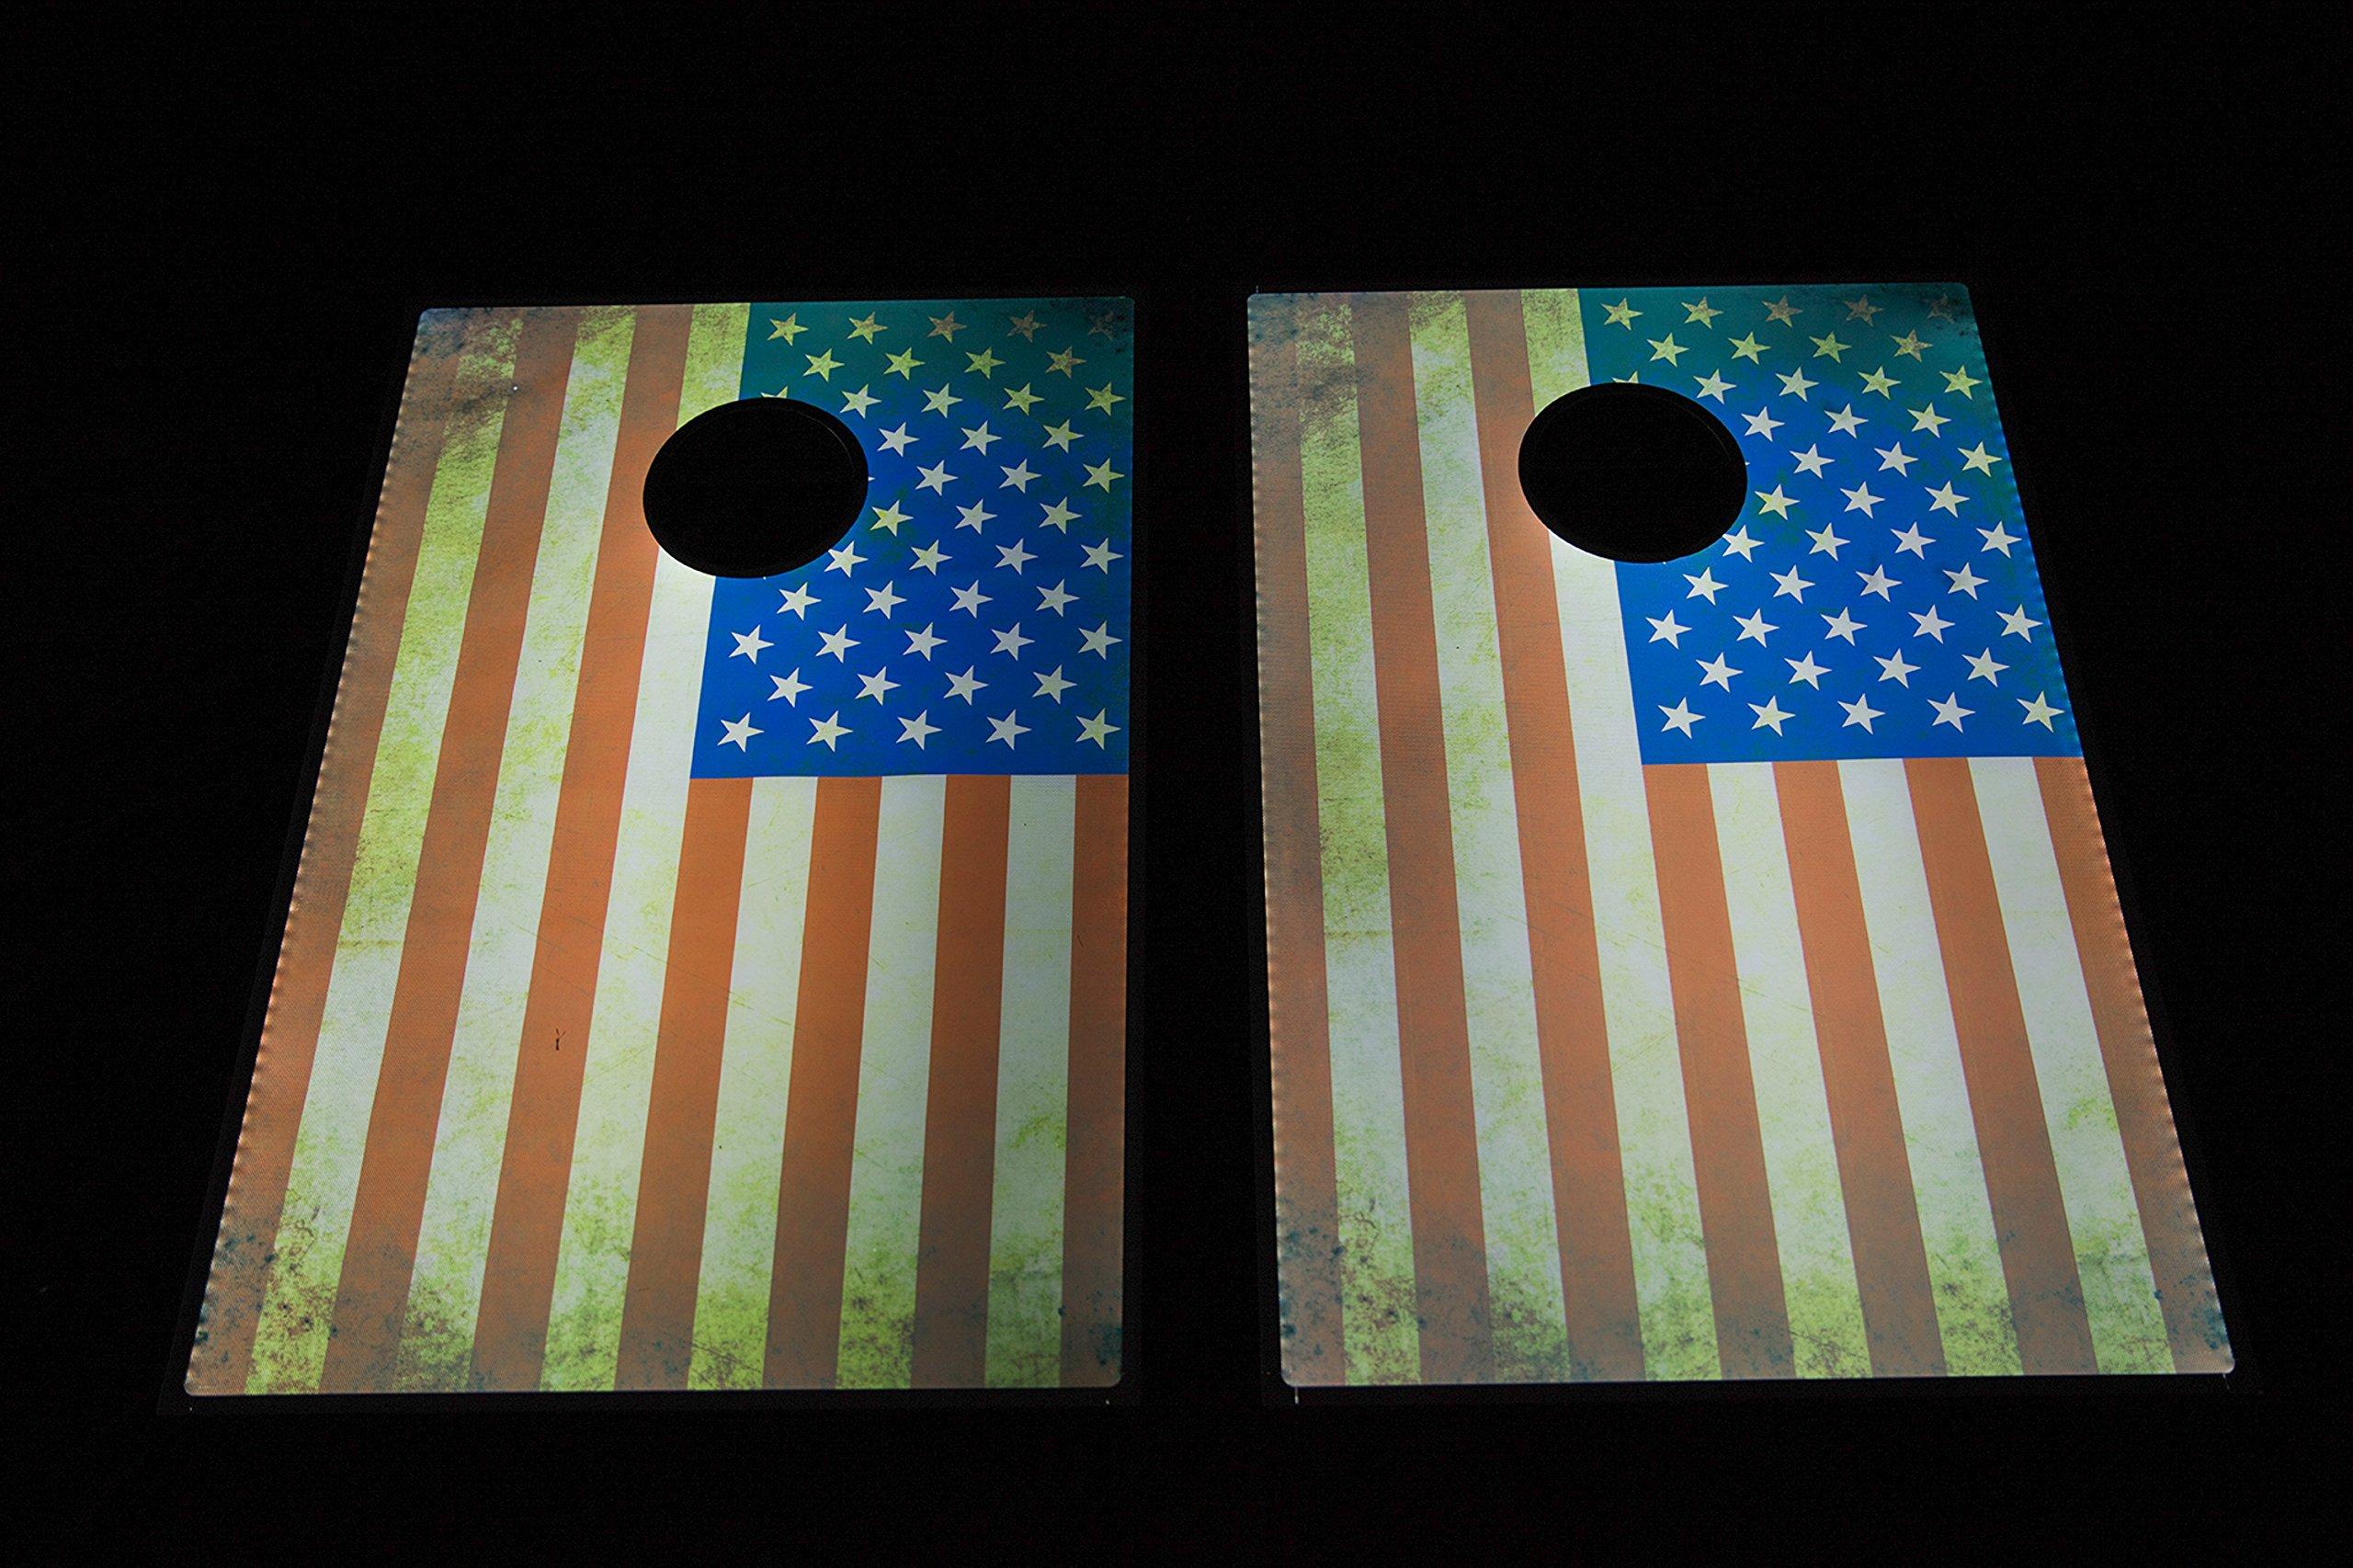 Sports Festival Light Up LED Cornhole Board Bean Bag Toss Game Set by Sports Festival (Image #2)